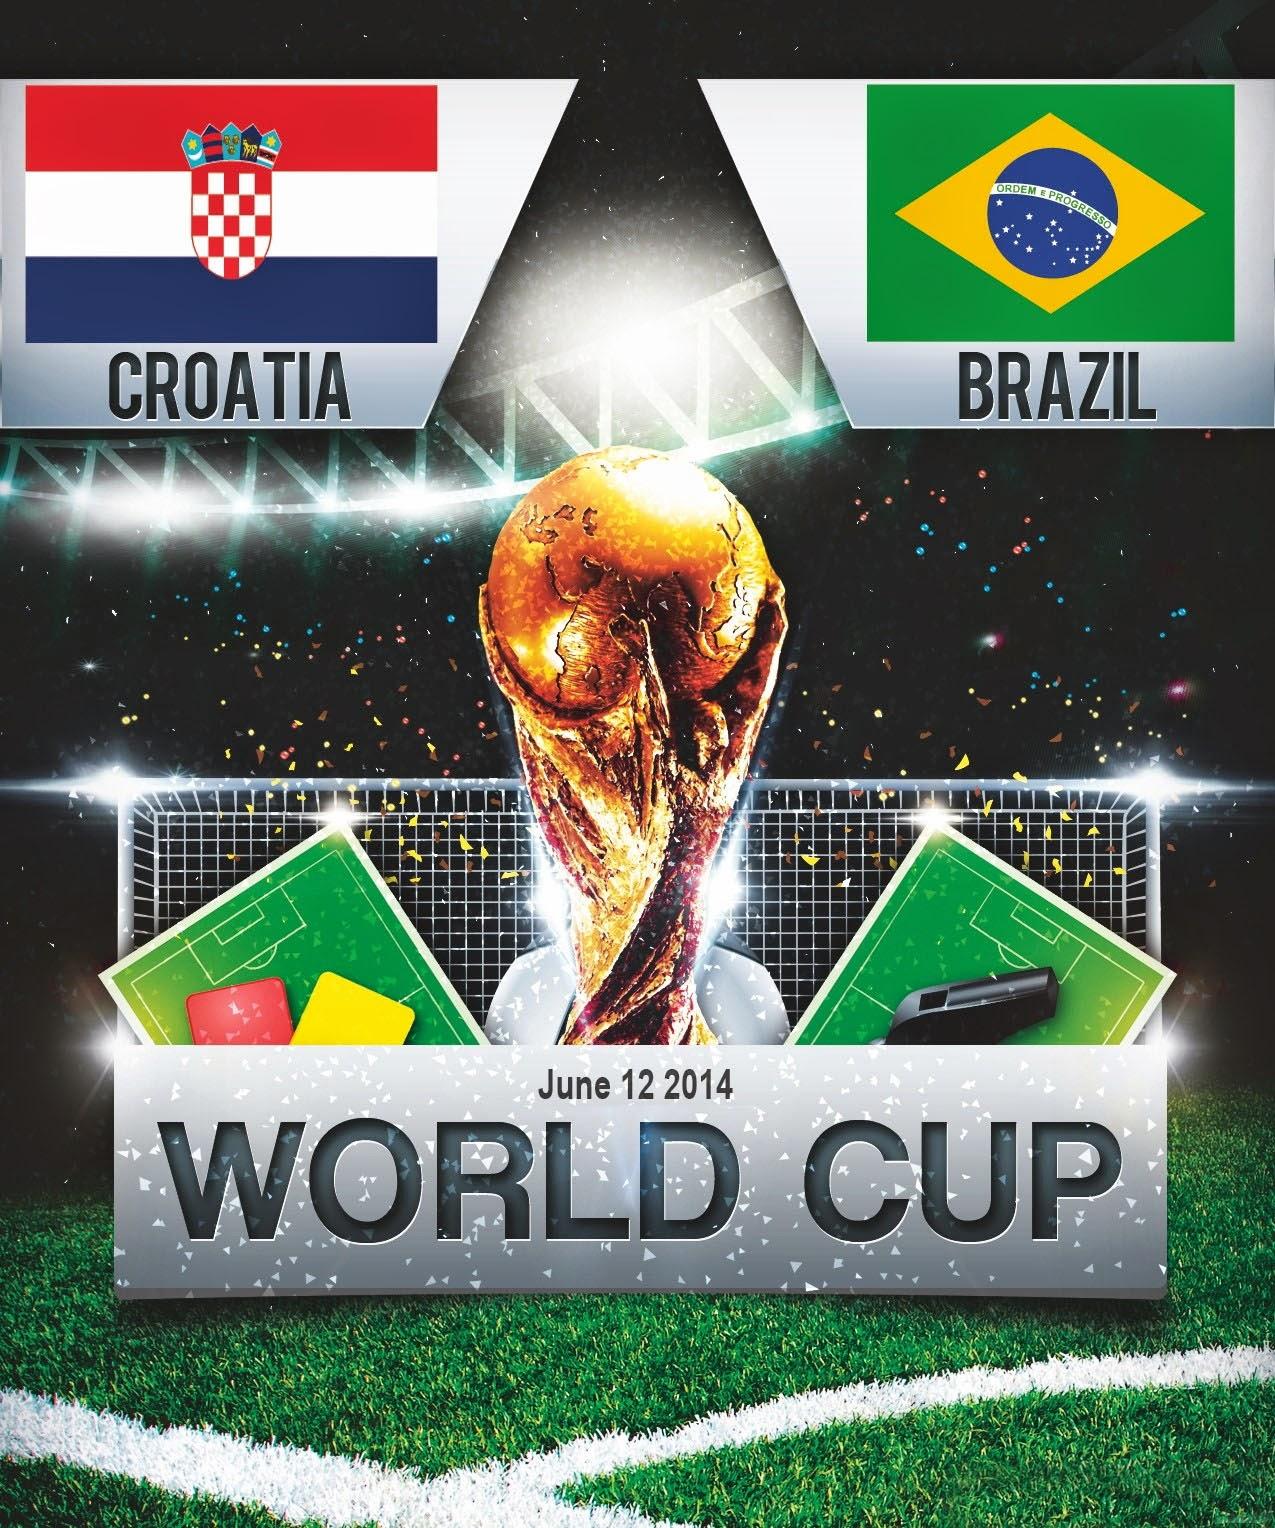 FIFA World Cup 2014 - Brazil Vs Crotia